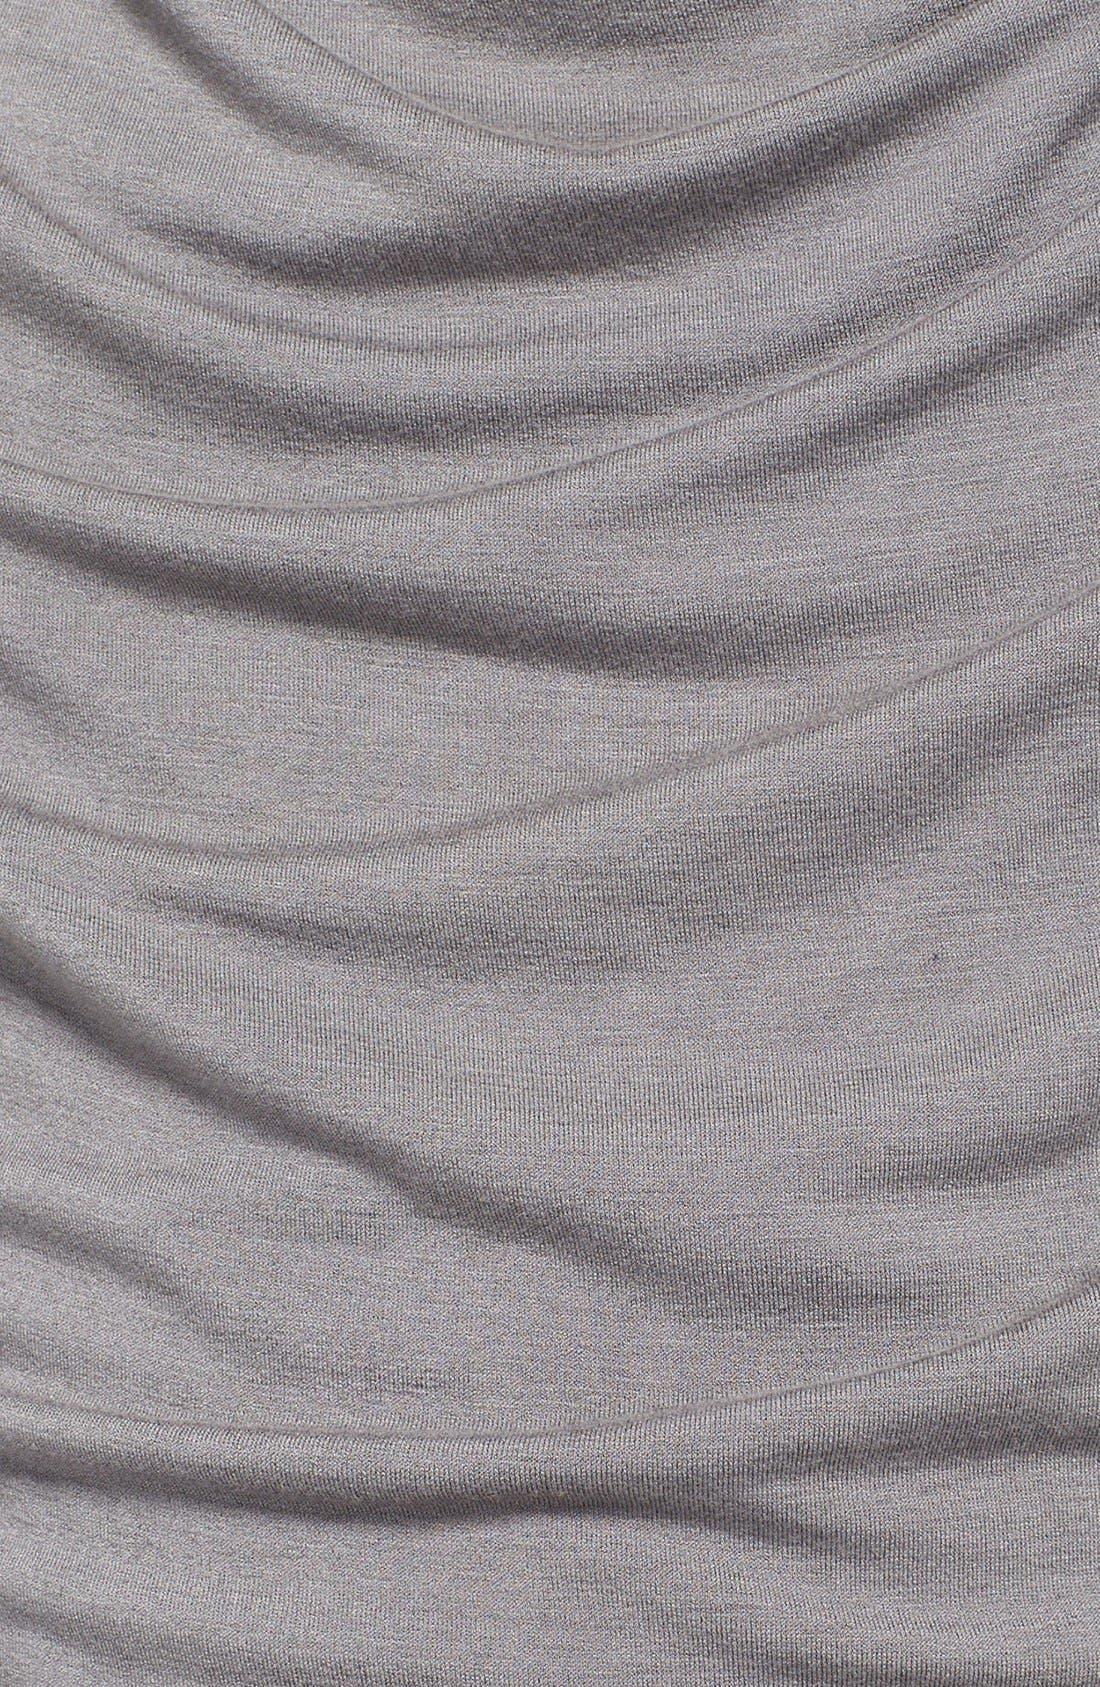 Alternate Image 3  - Donna Karan Collection 'Body' Belted Jersey Dress